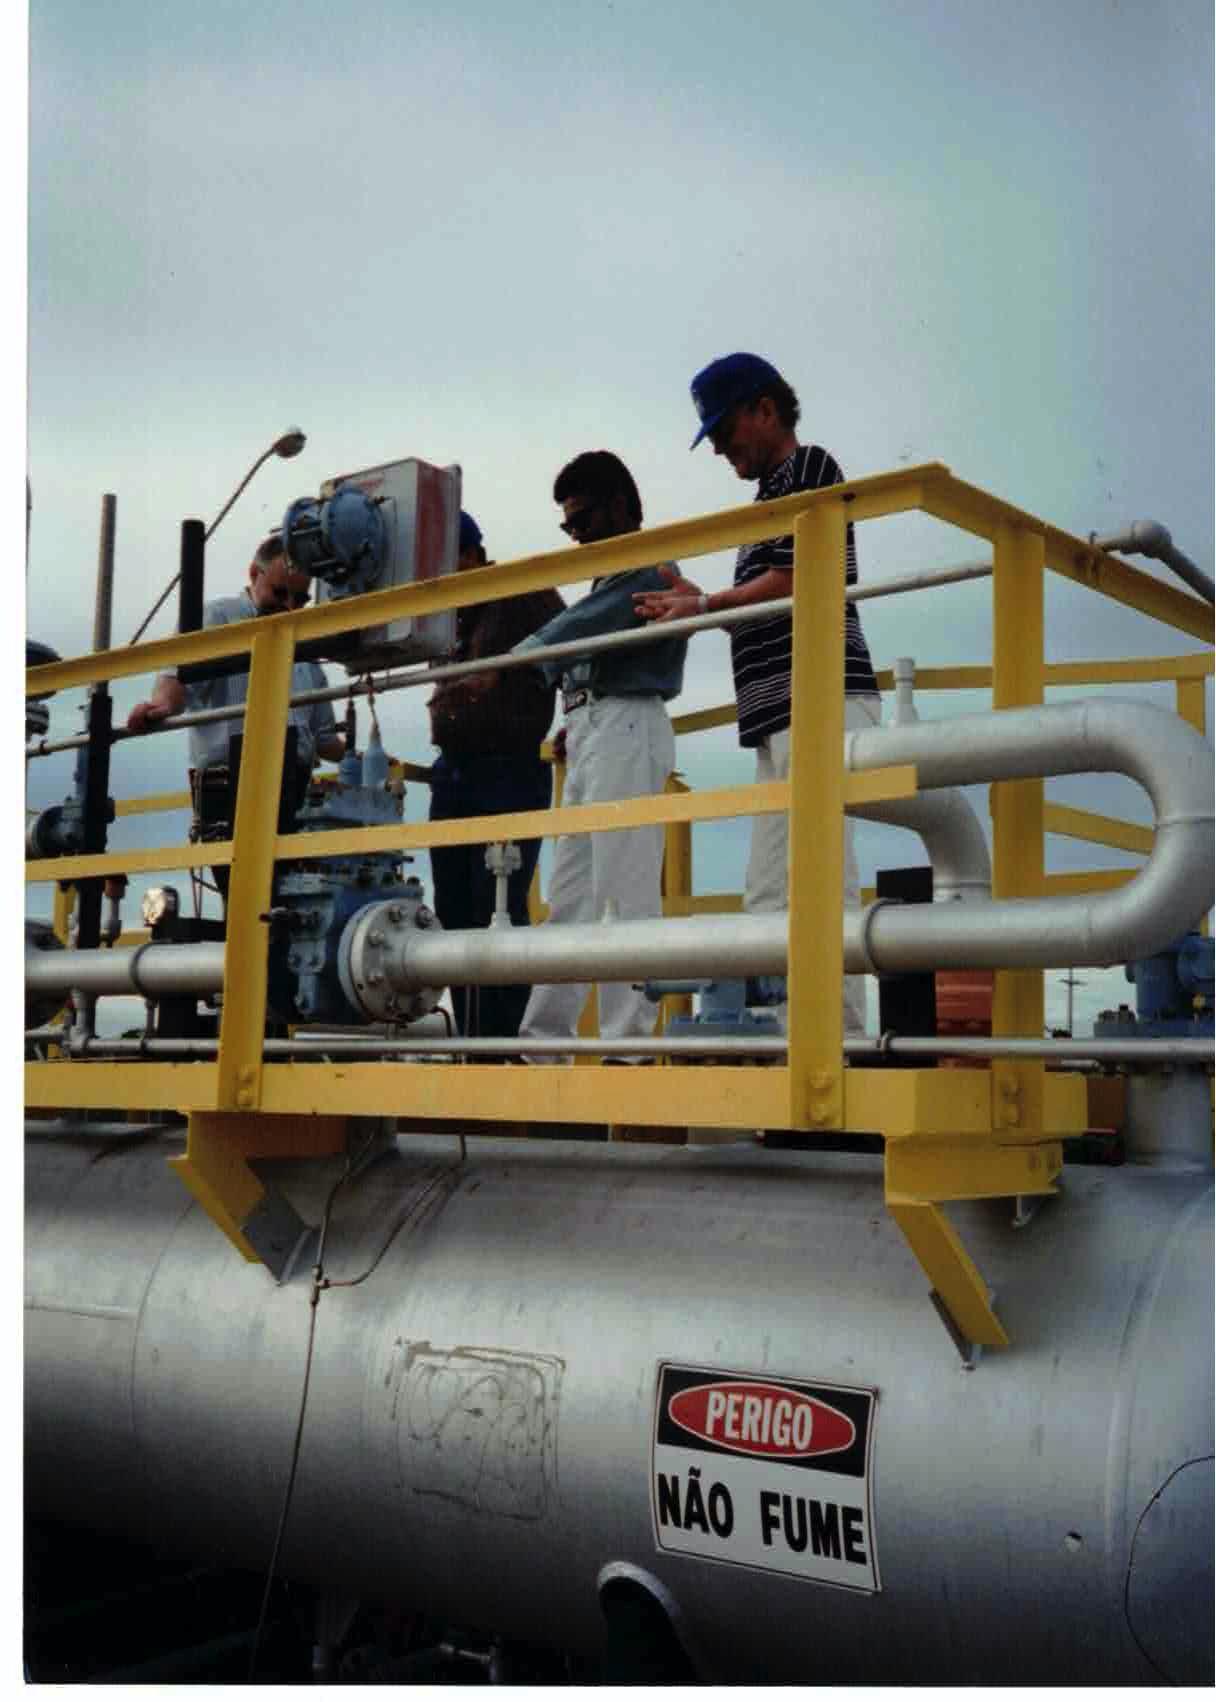 Mossoro Brazil, Petrobras Faciity 1